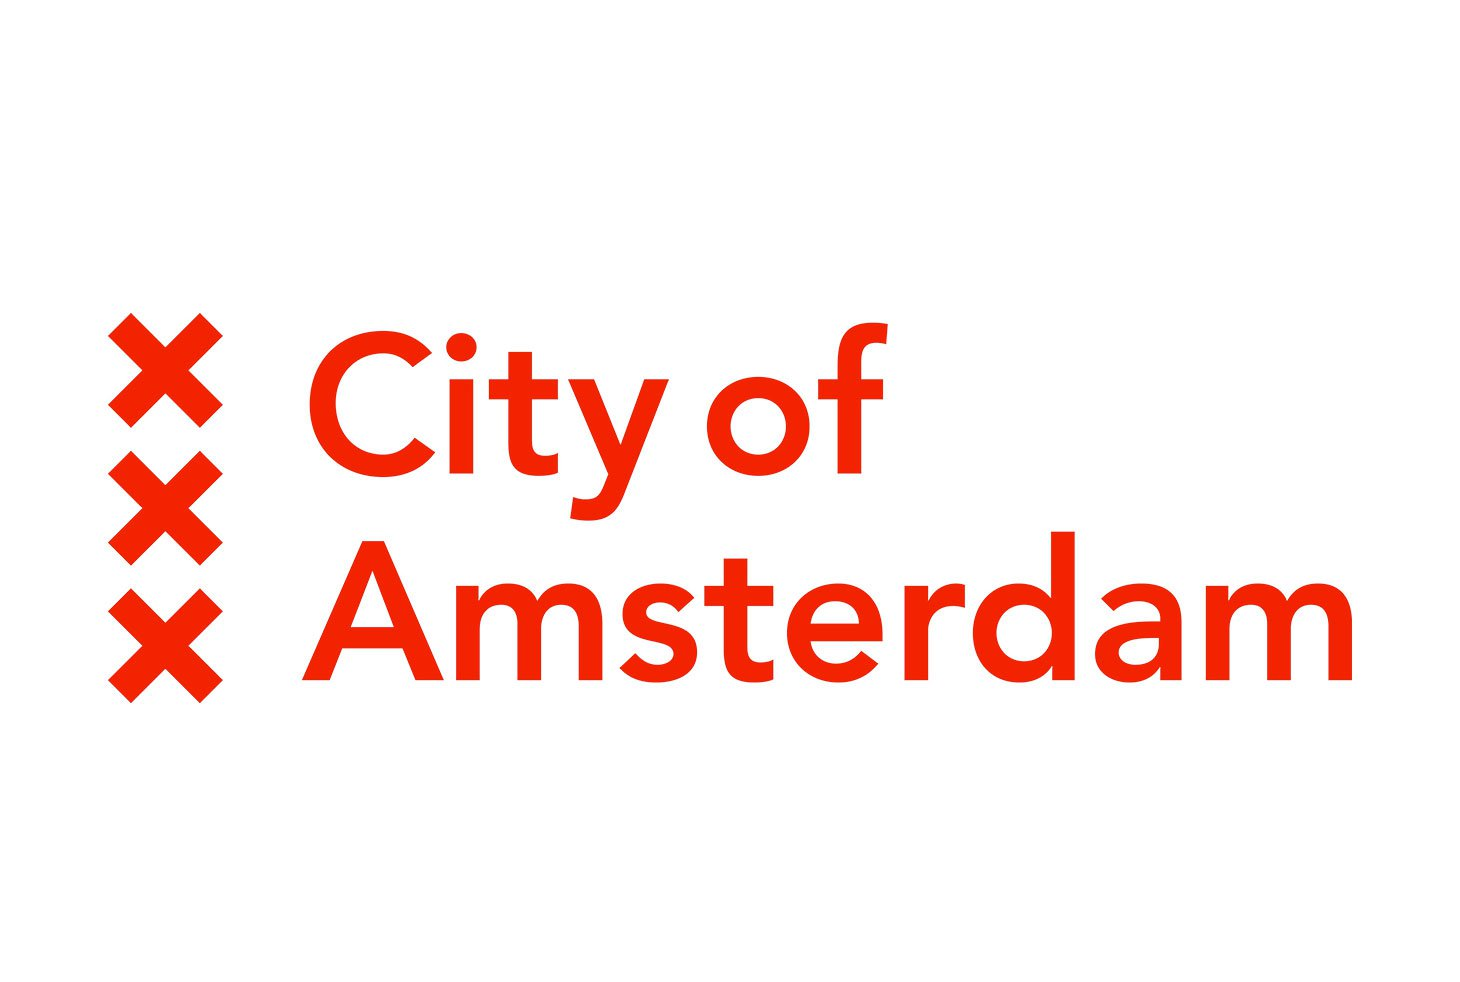 City of Amsterdam logo